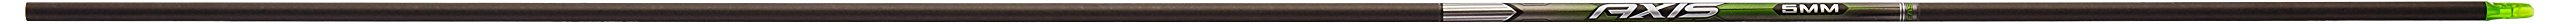 Easton Axis N-Fused Raw Shafts Doz, Multi